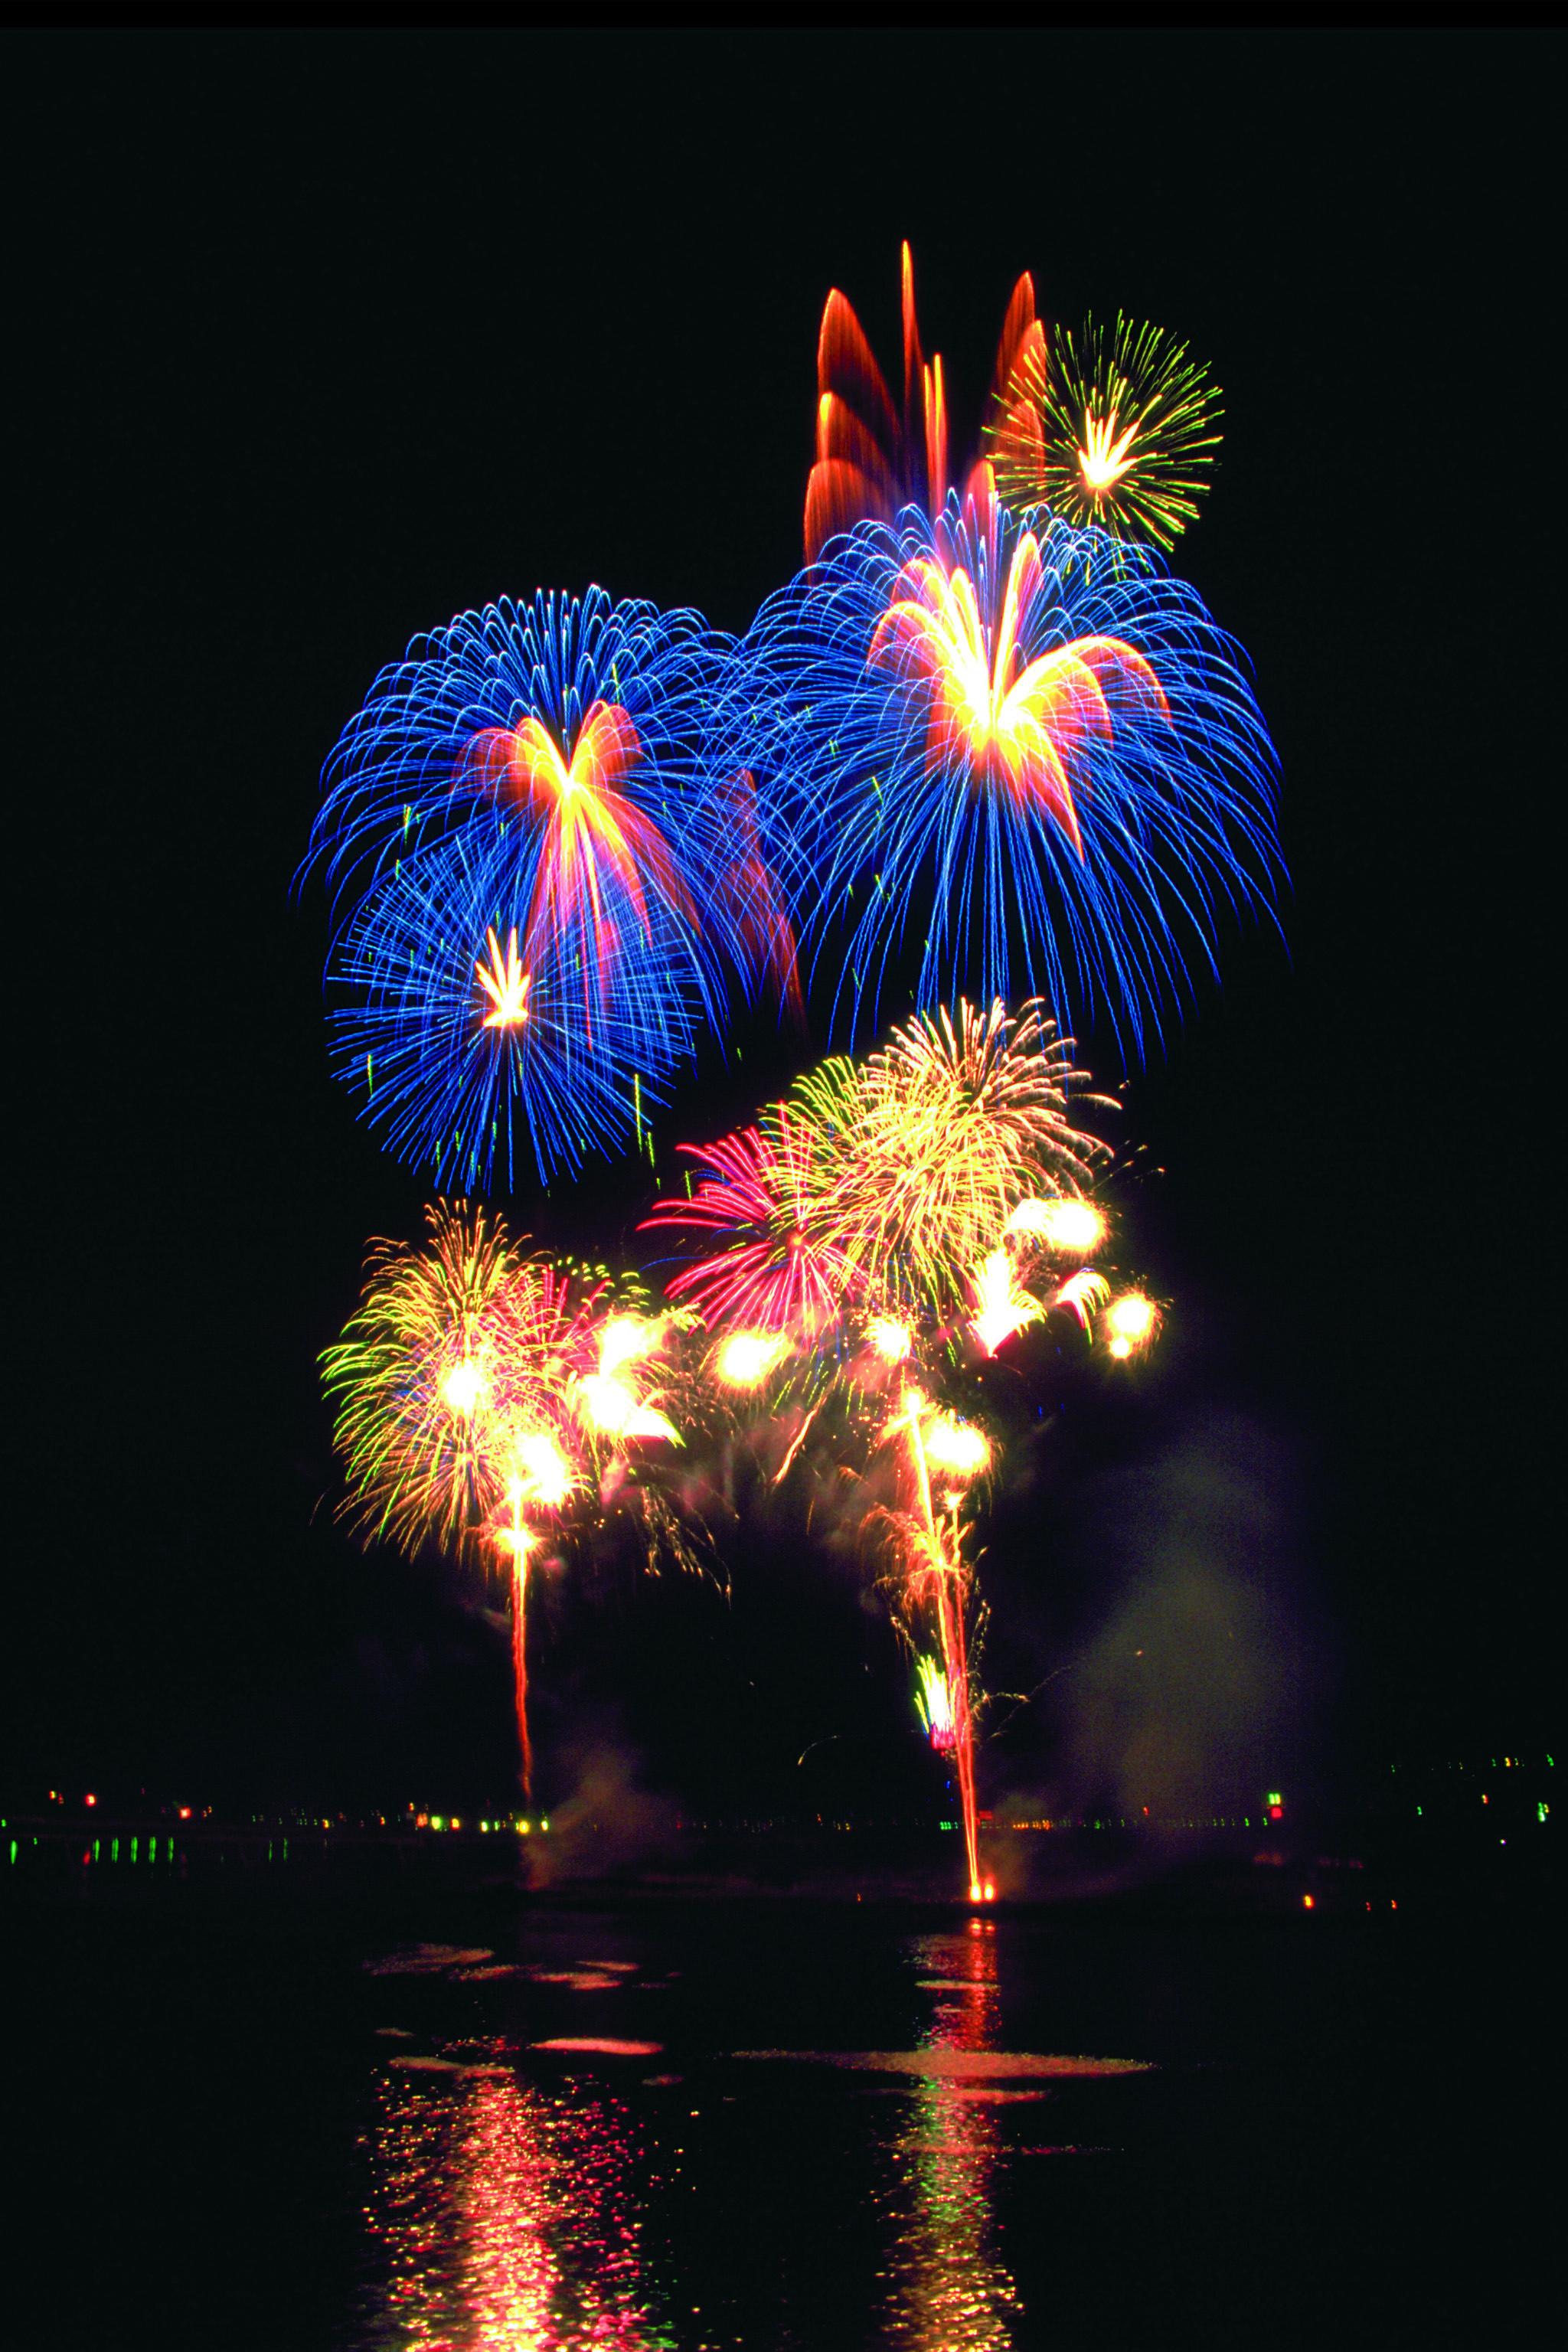 #reflections #fireworks #pyrotechnics